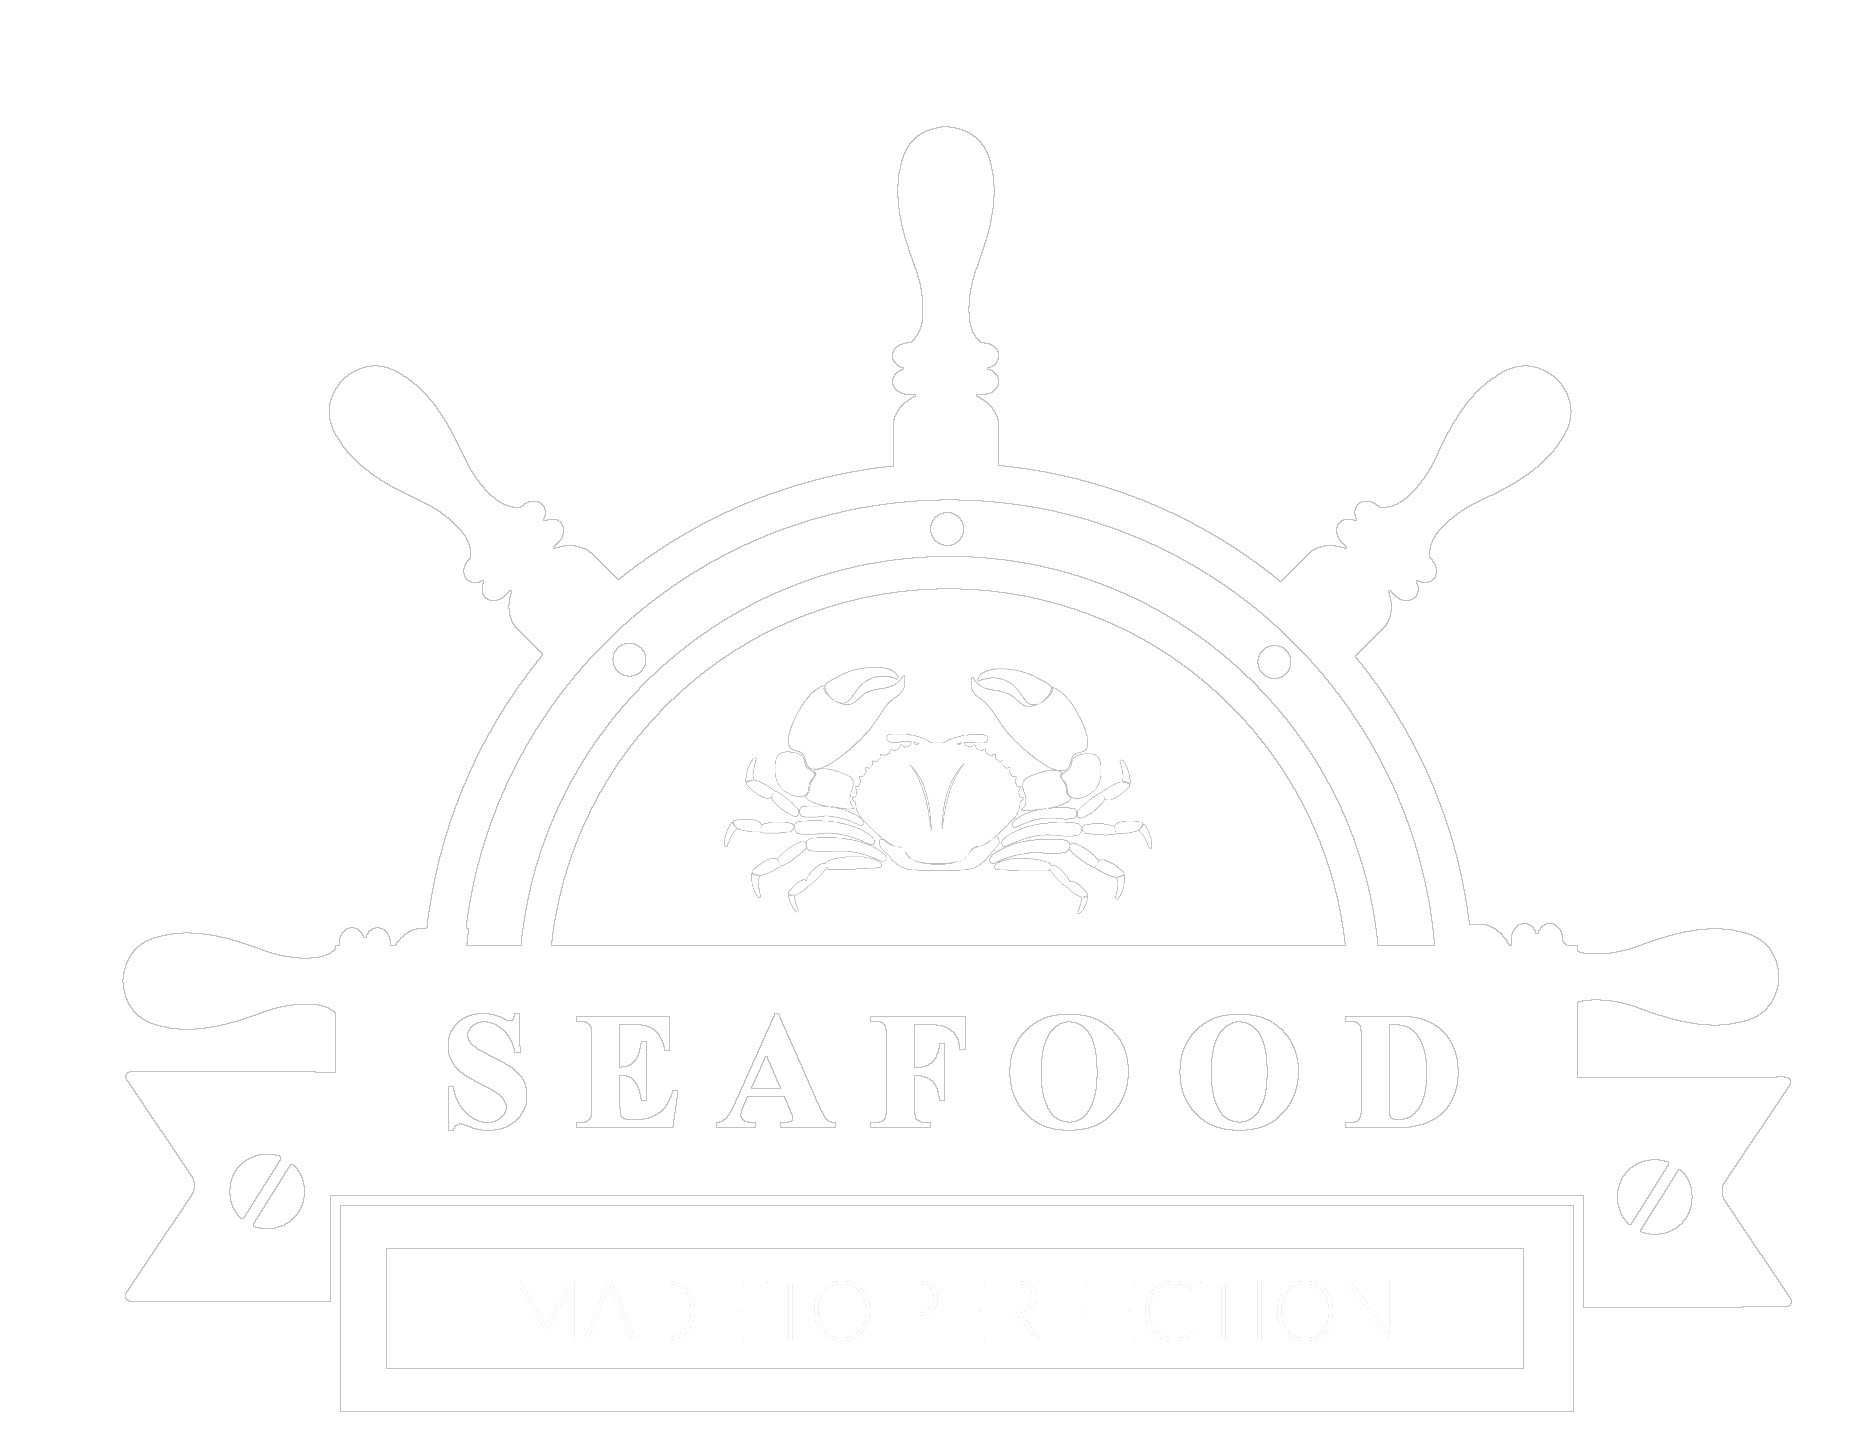 Seafood Restaurant Savannah, GA